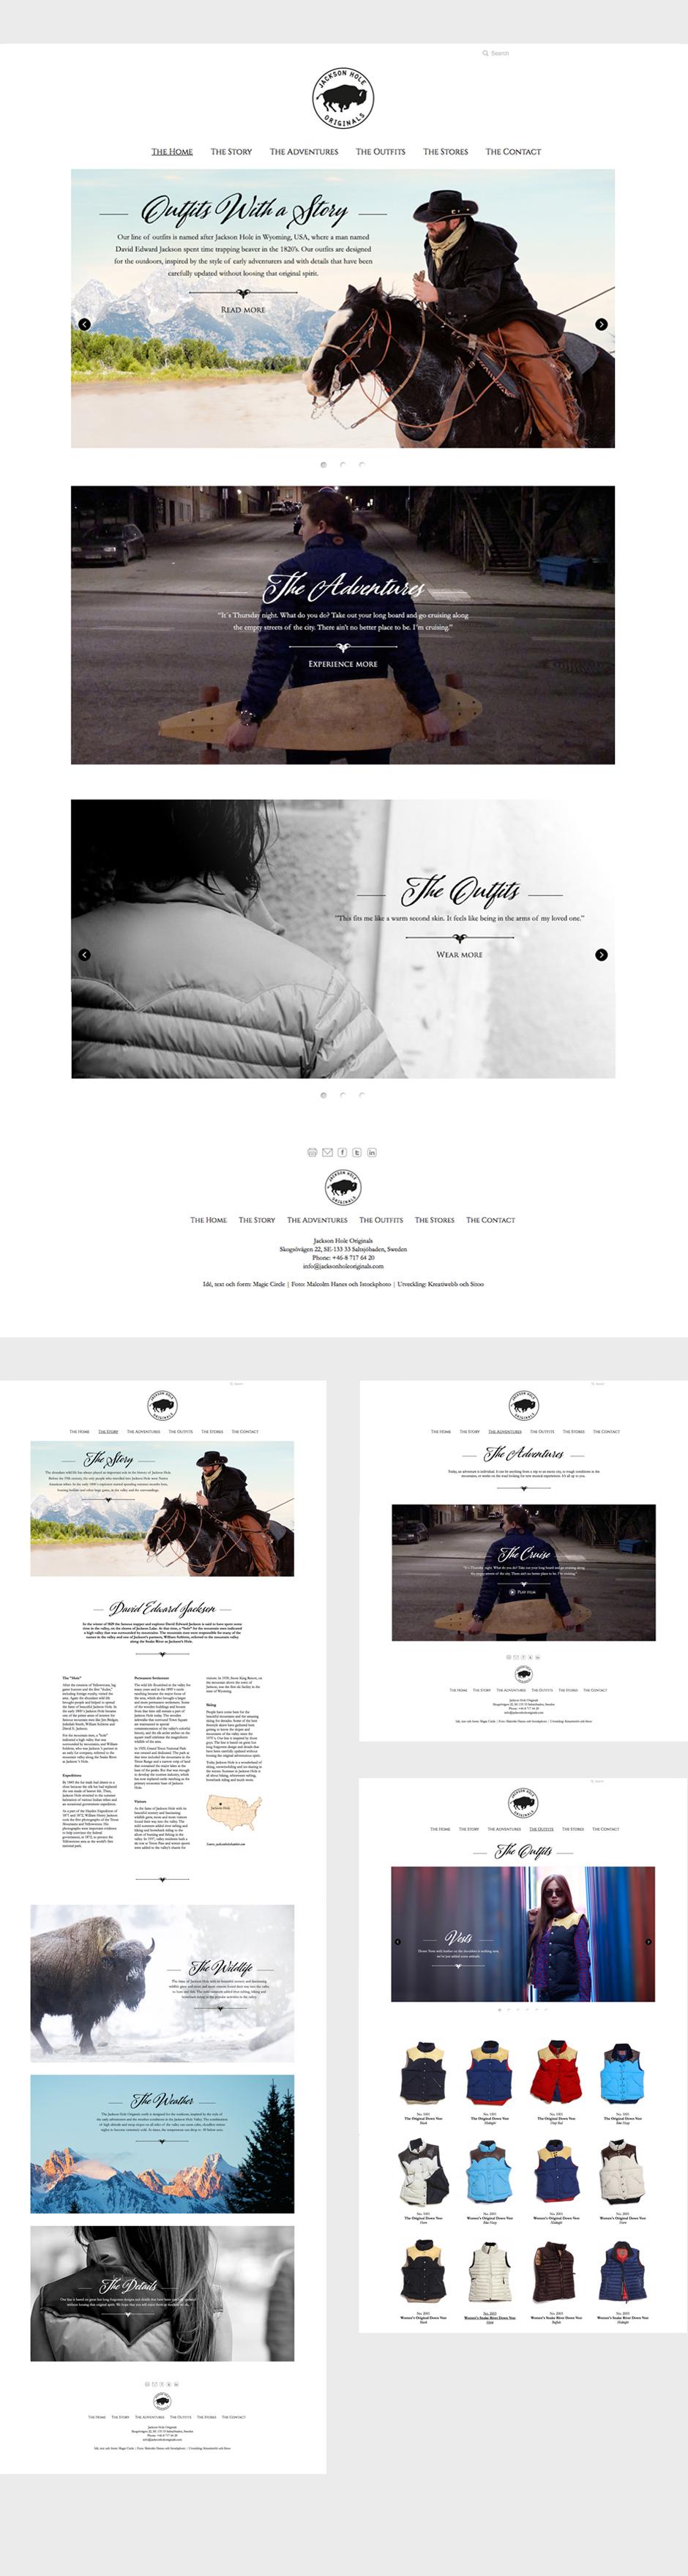 Jackson Hole Originals webbplats